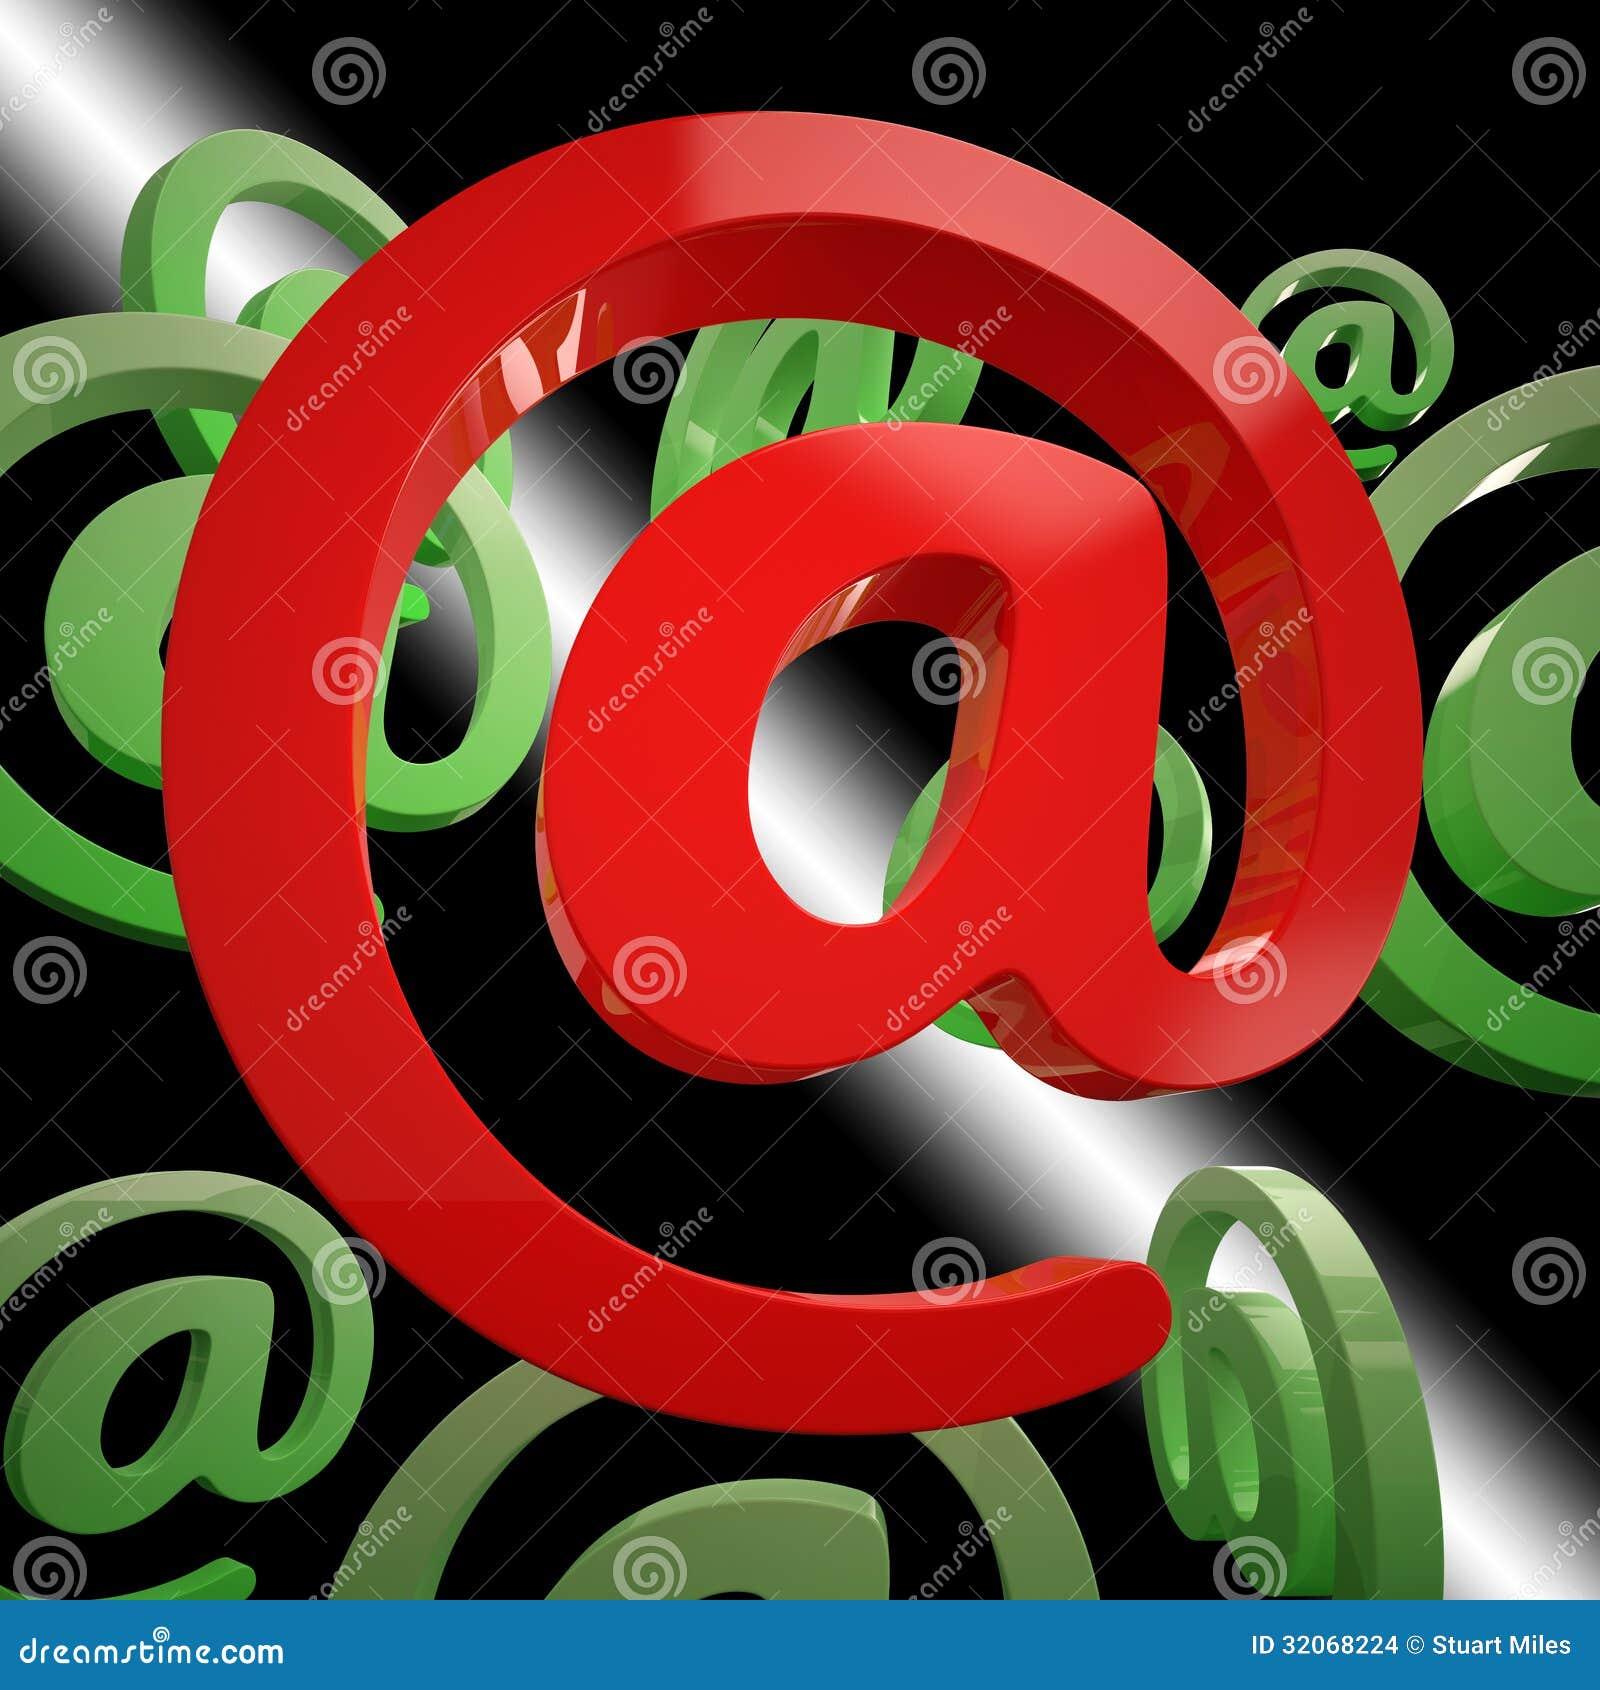 essay on communication through internet